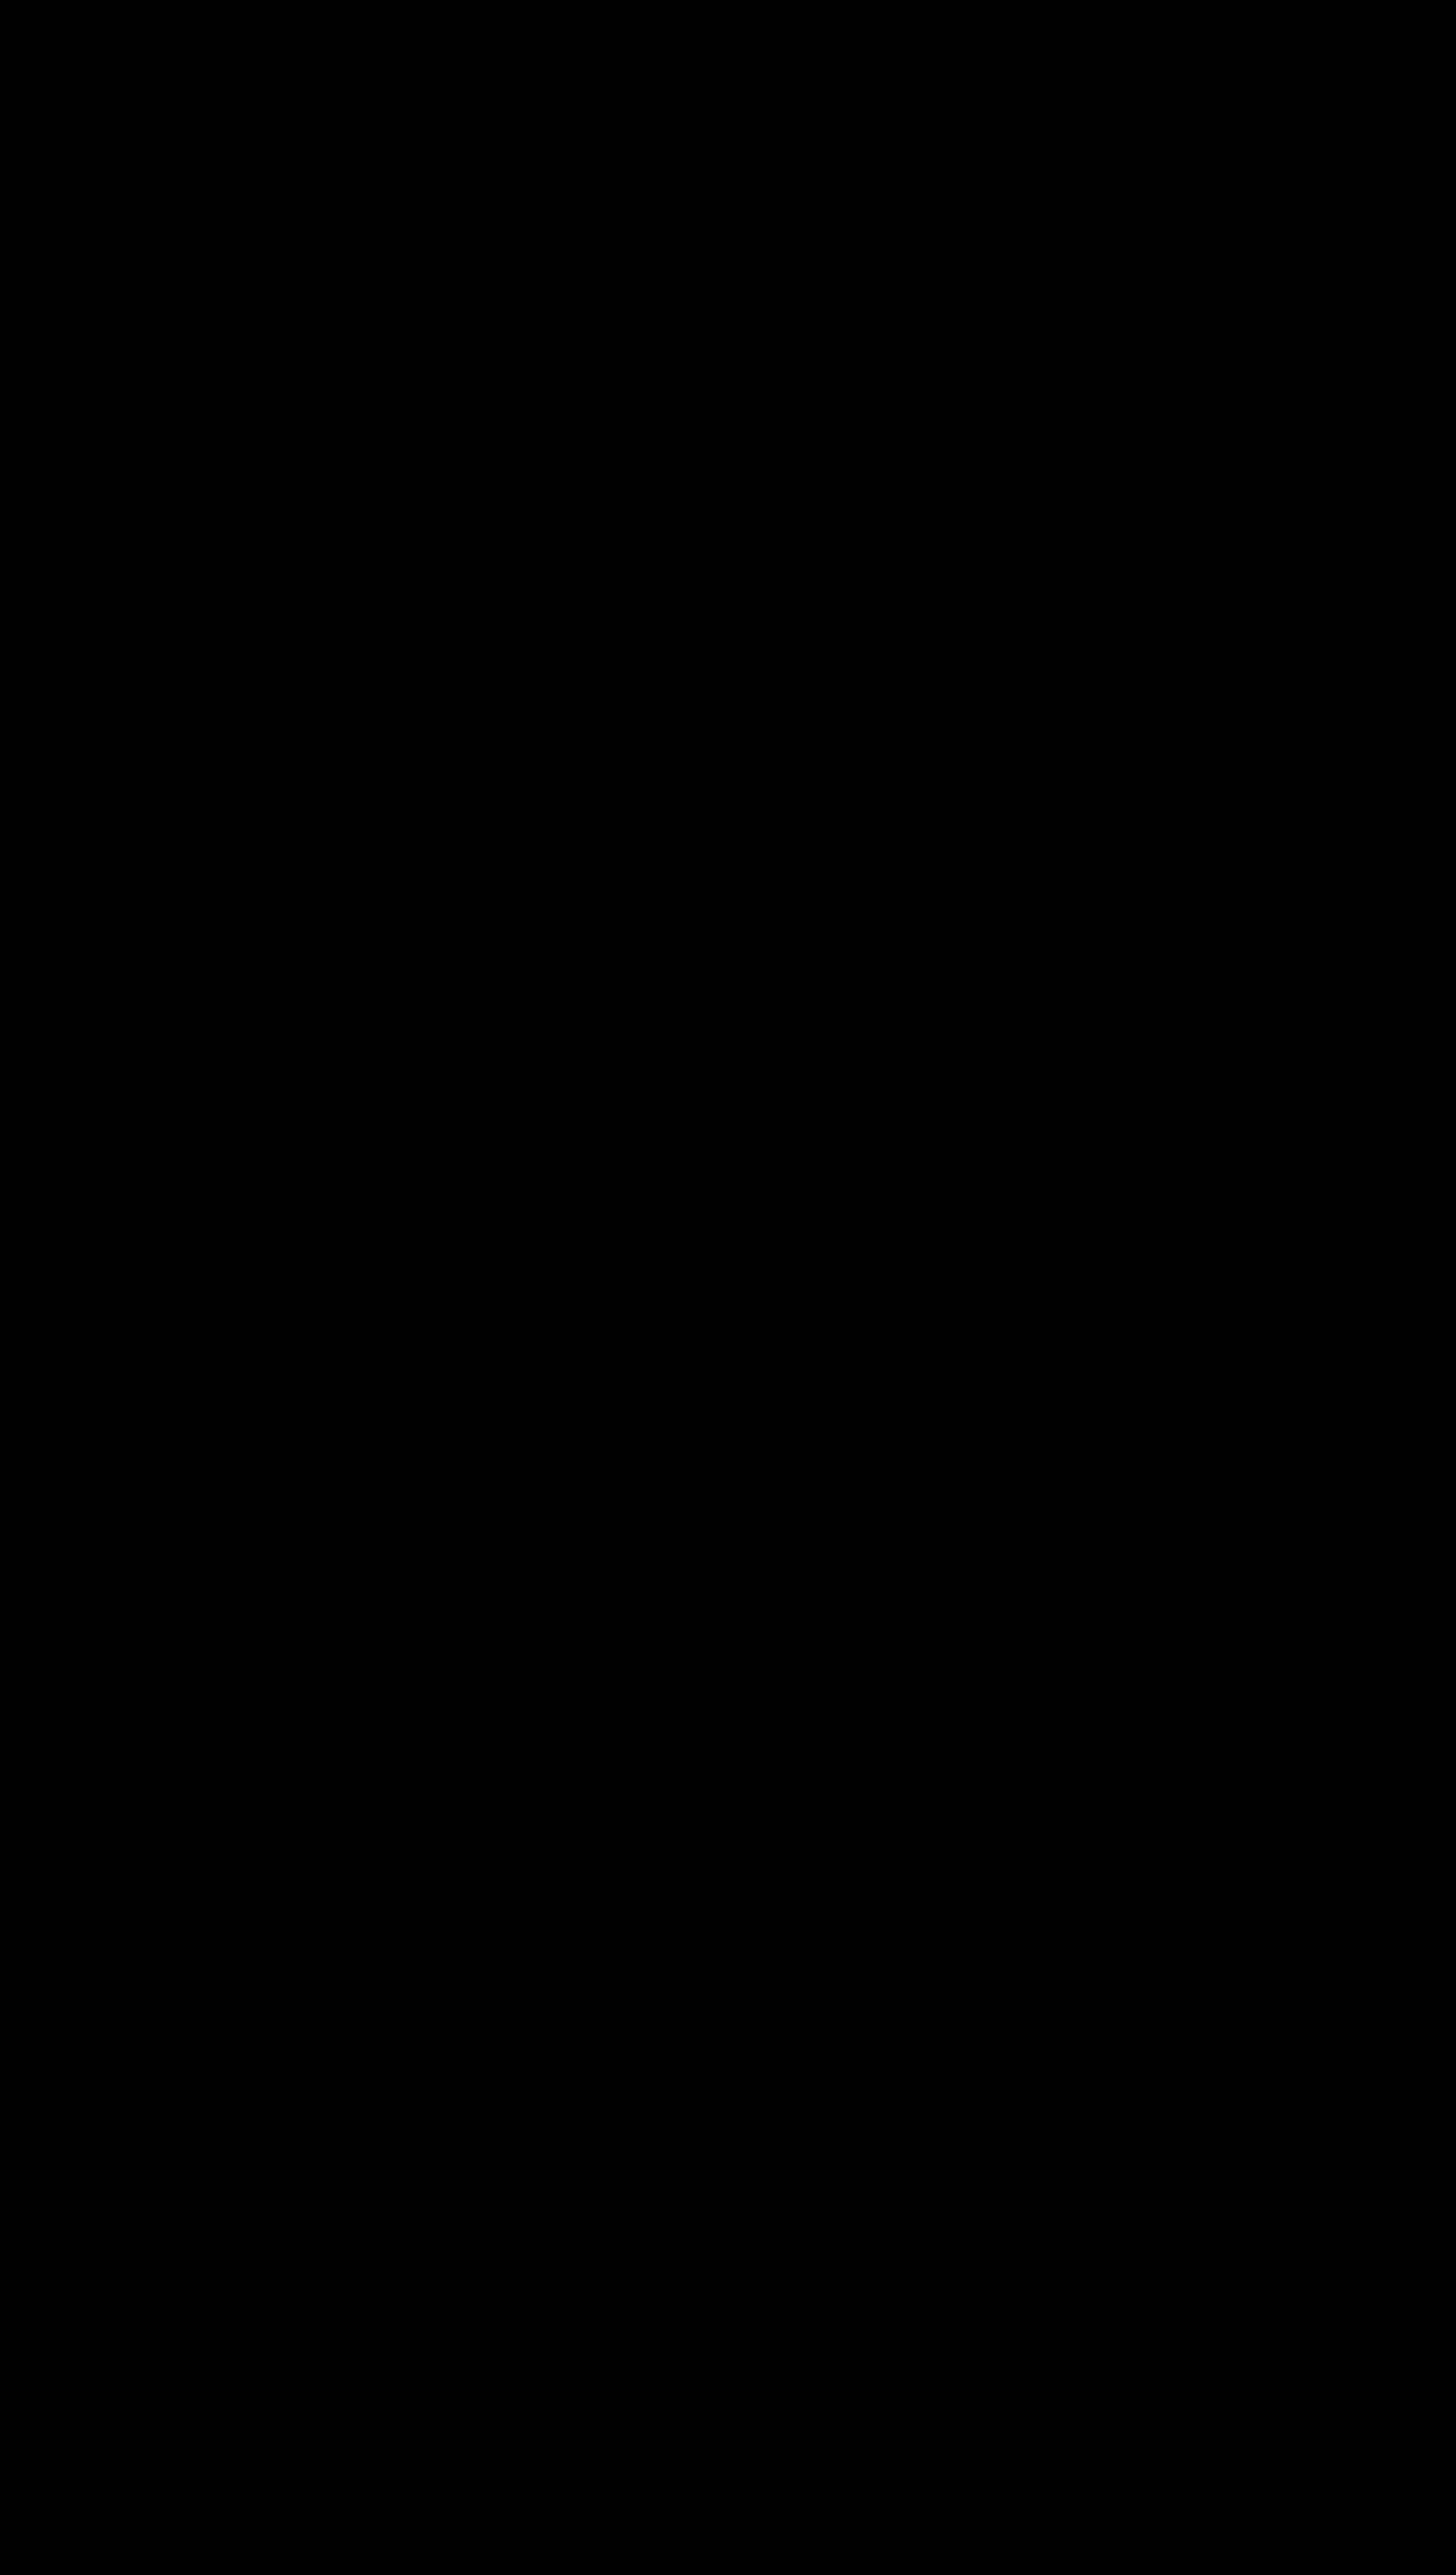 Guild Logos Download